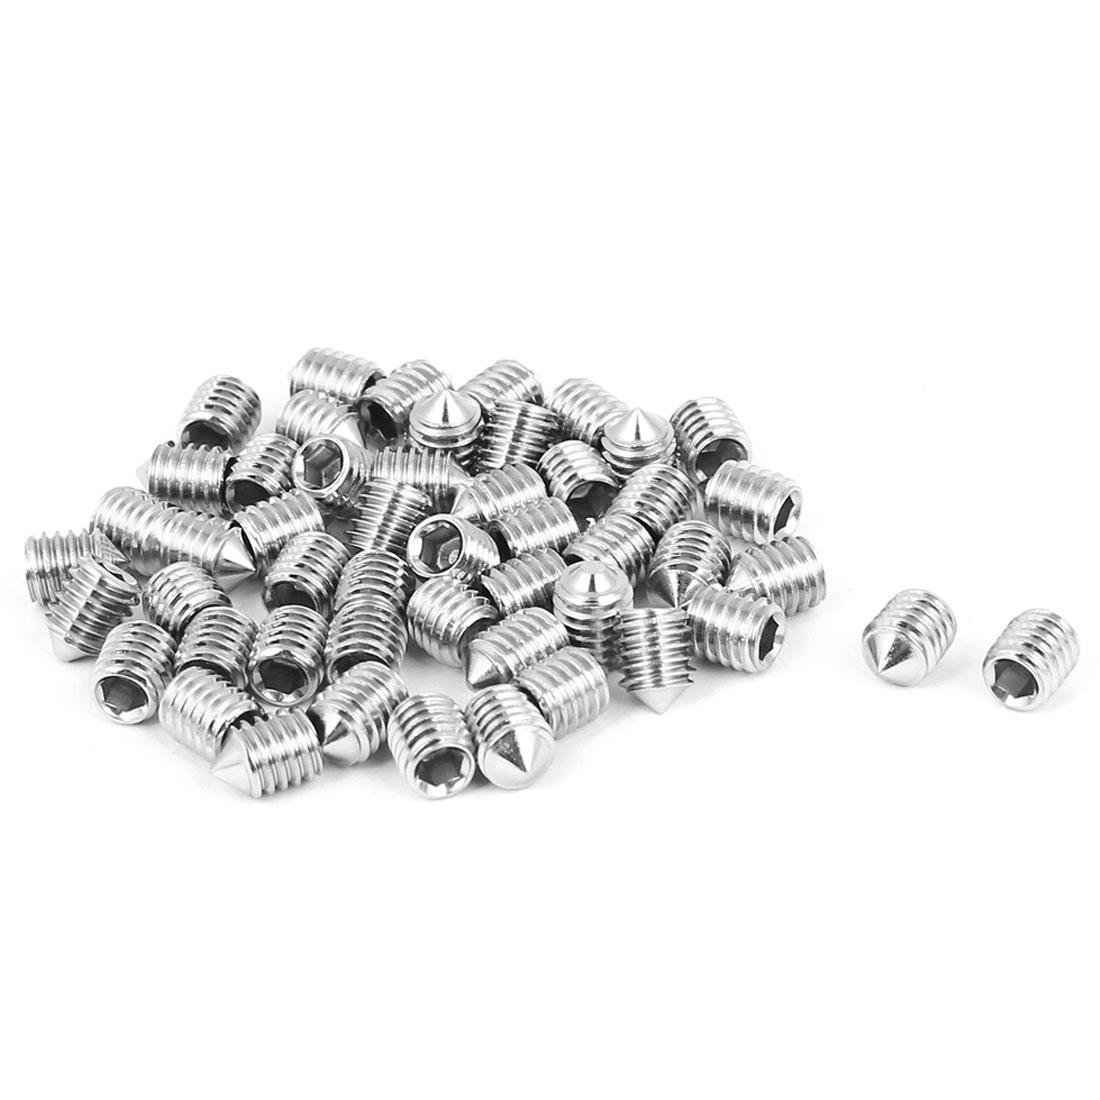 M6x8mm 1mm Pitch Stainless Steel Cone Point Hexagon Socket Grub Screws 50pcs